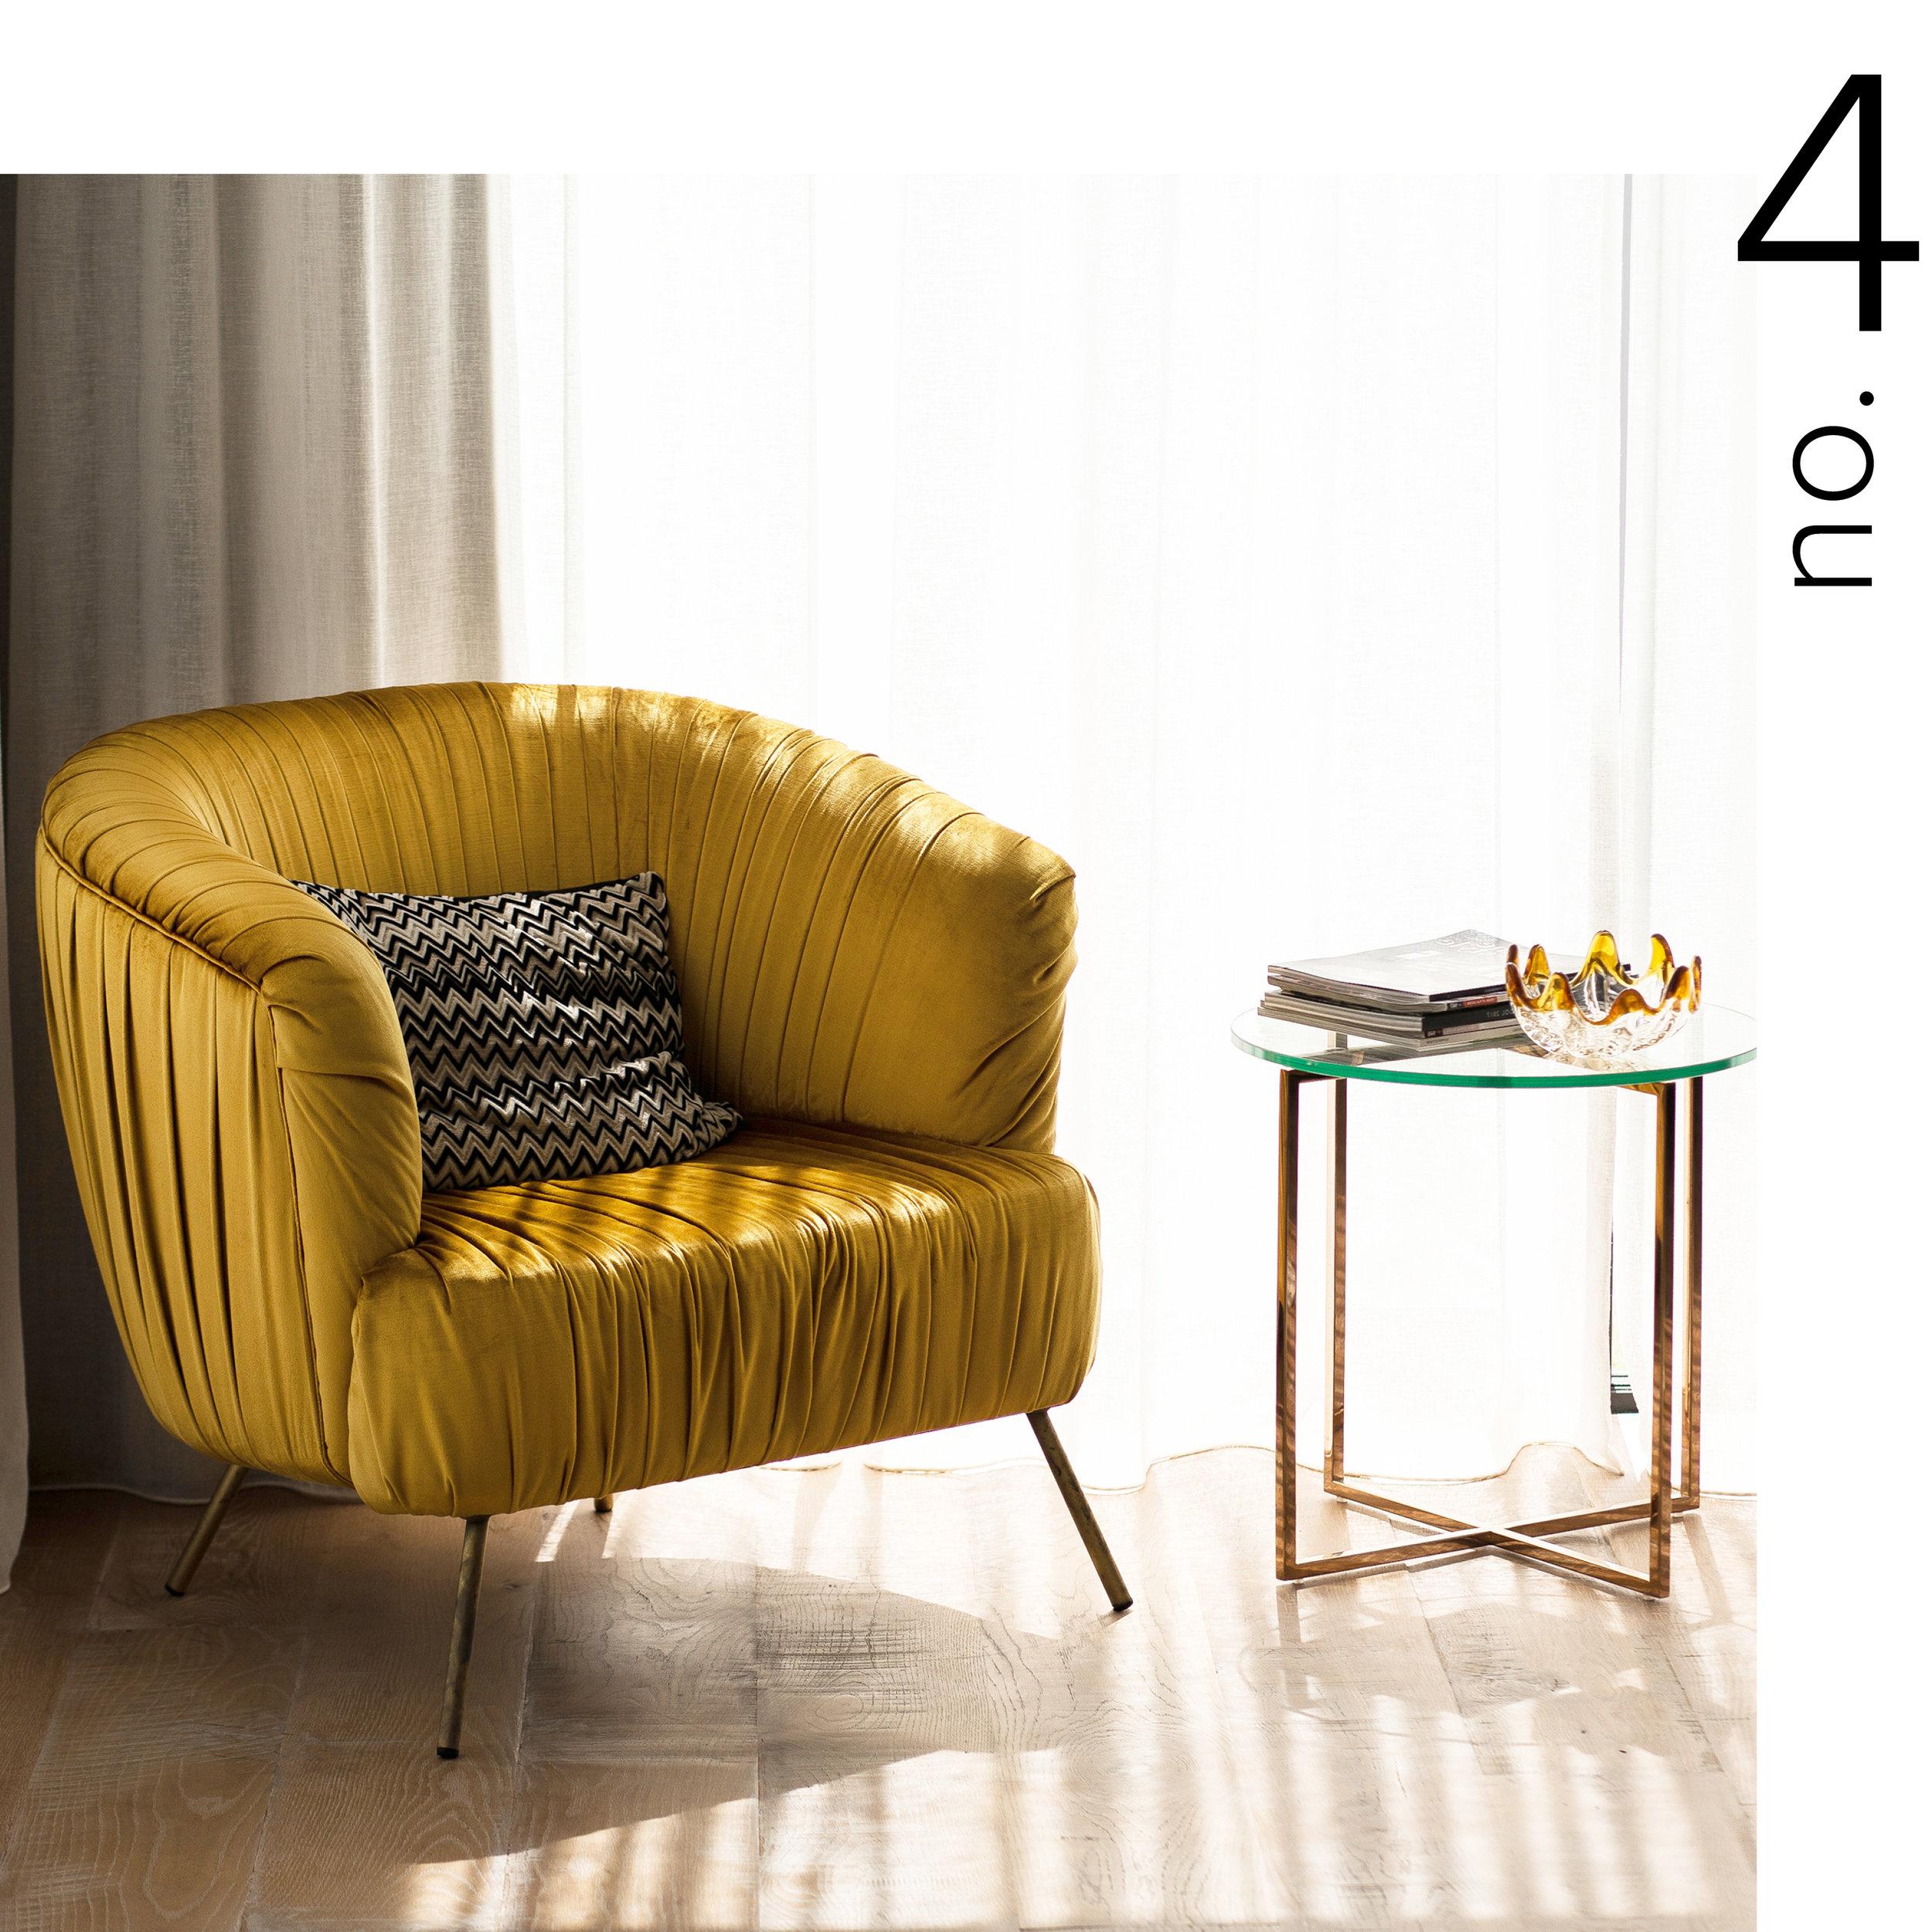 Kirsten Ford Design-Interior Design Tip 4